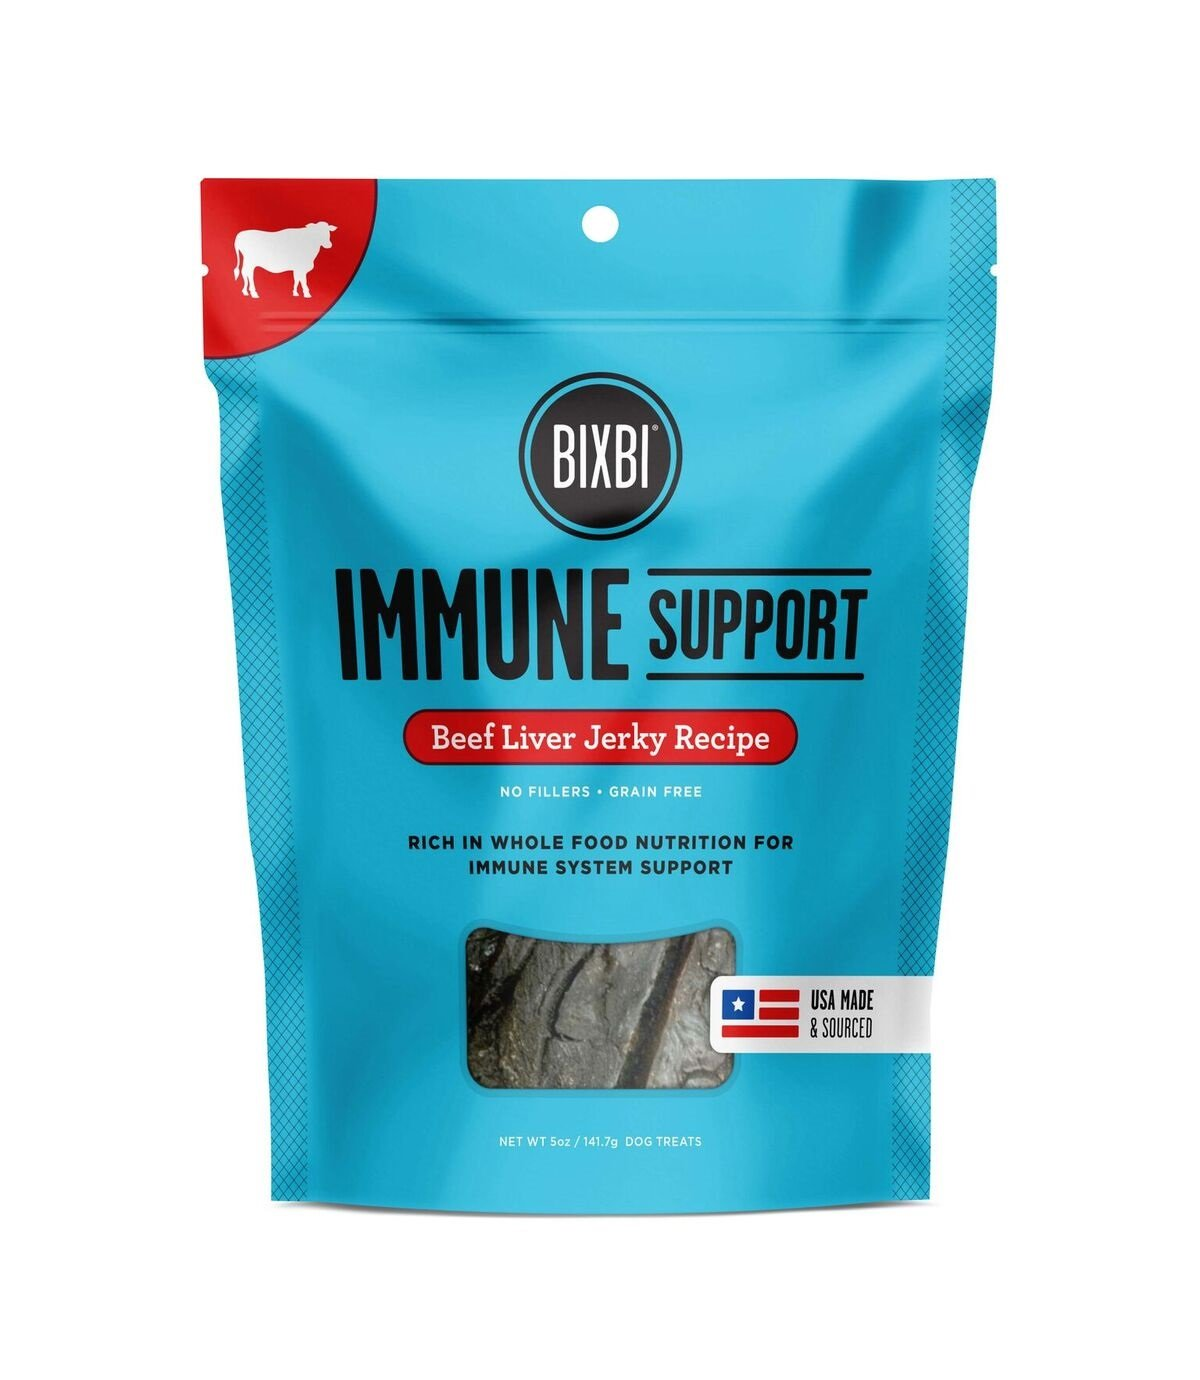 BIXBI Immune Support Dog Jerky Treats, Beef Liver, 5 Ounce